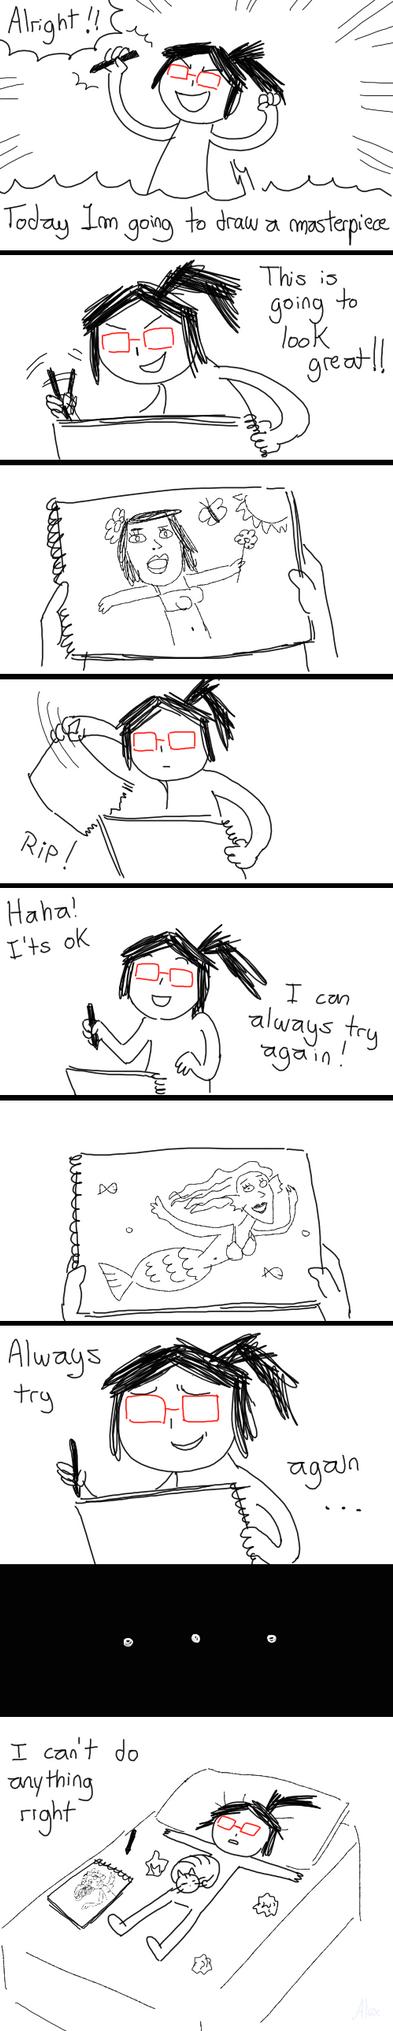 It isn't easy being an artist by churrokat